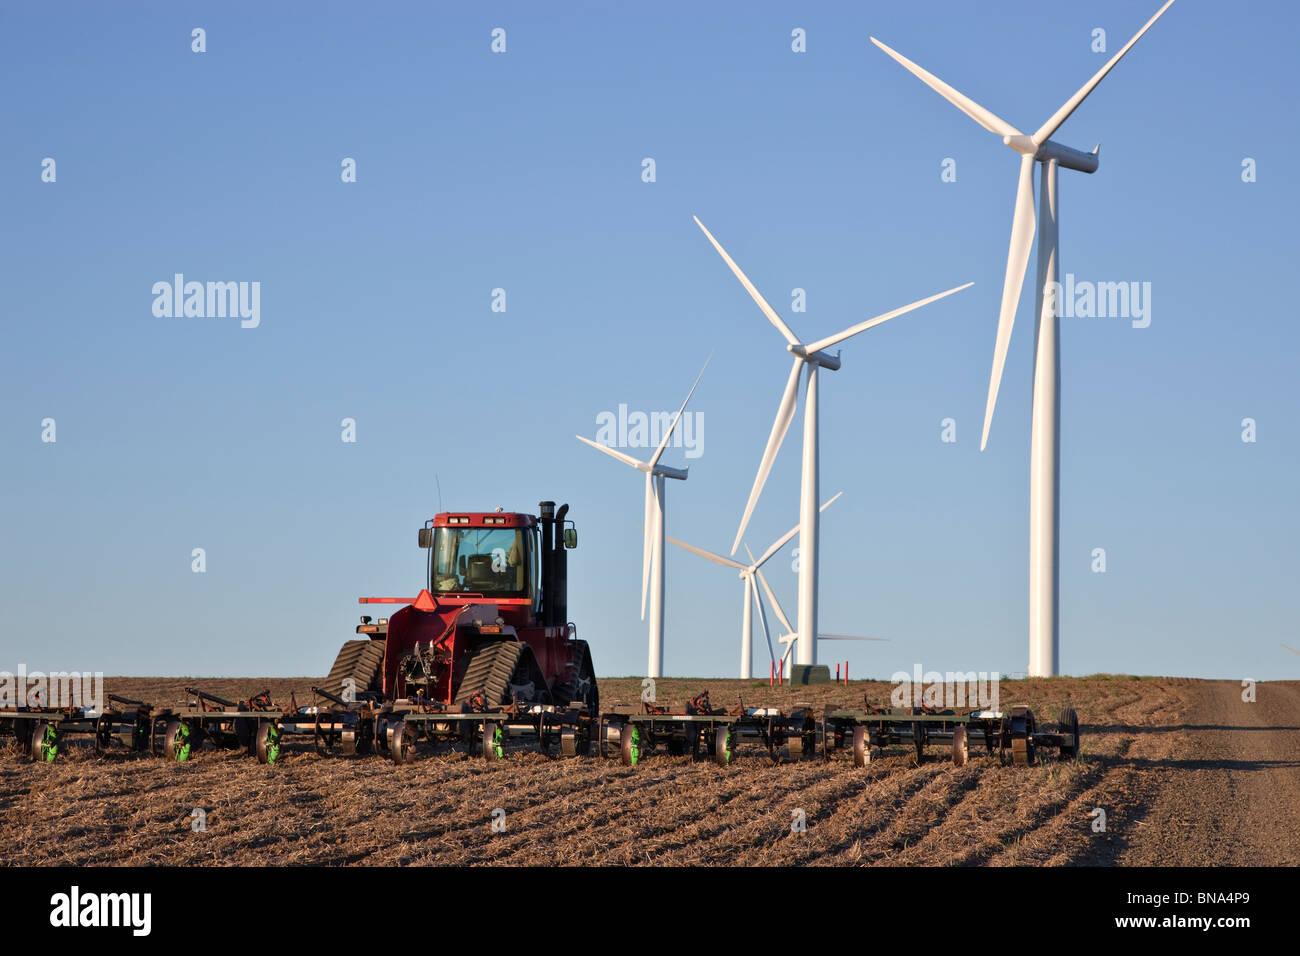 Tractor dragging harrow, fallow wheat field, wind farm. Stock Photo